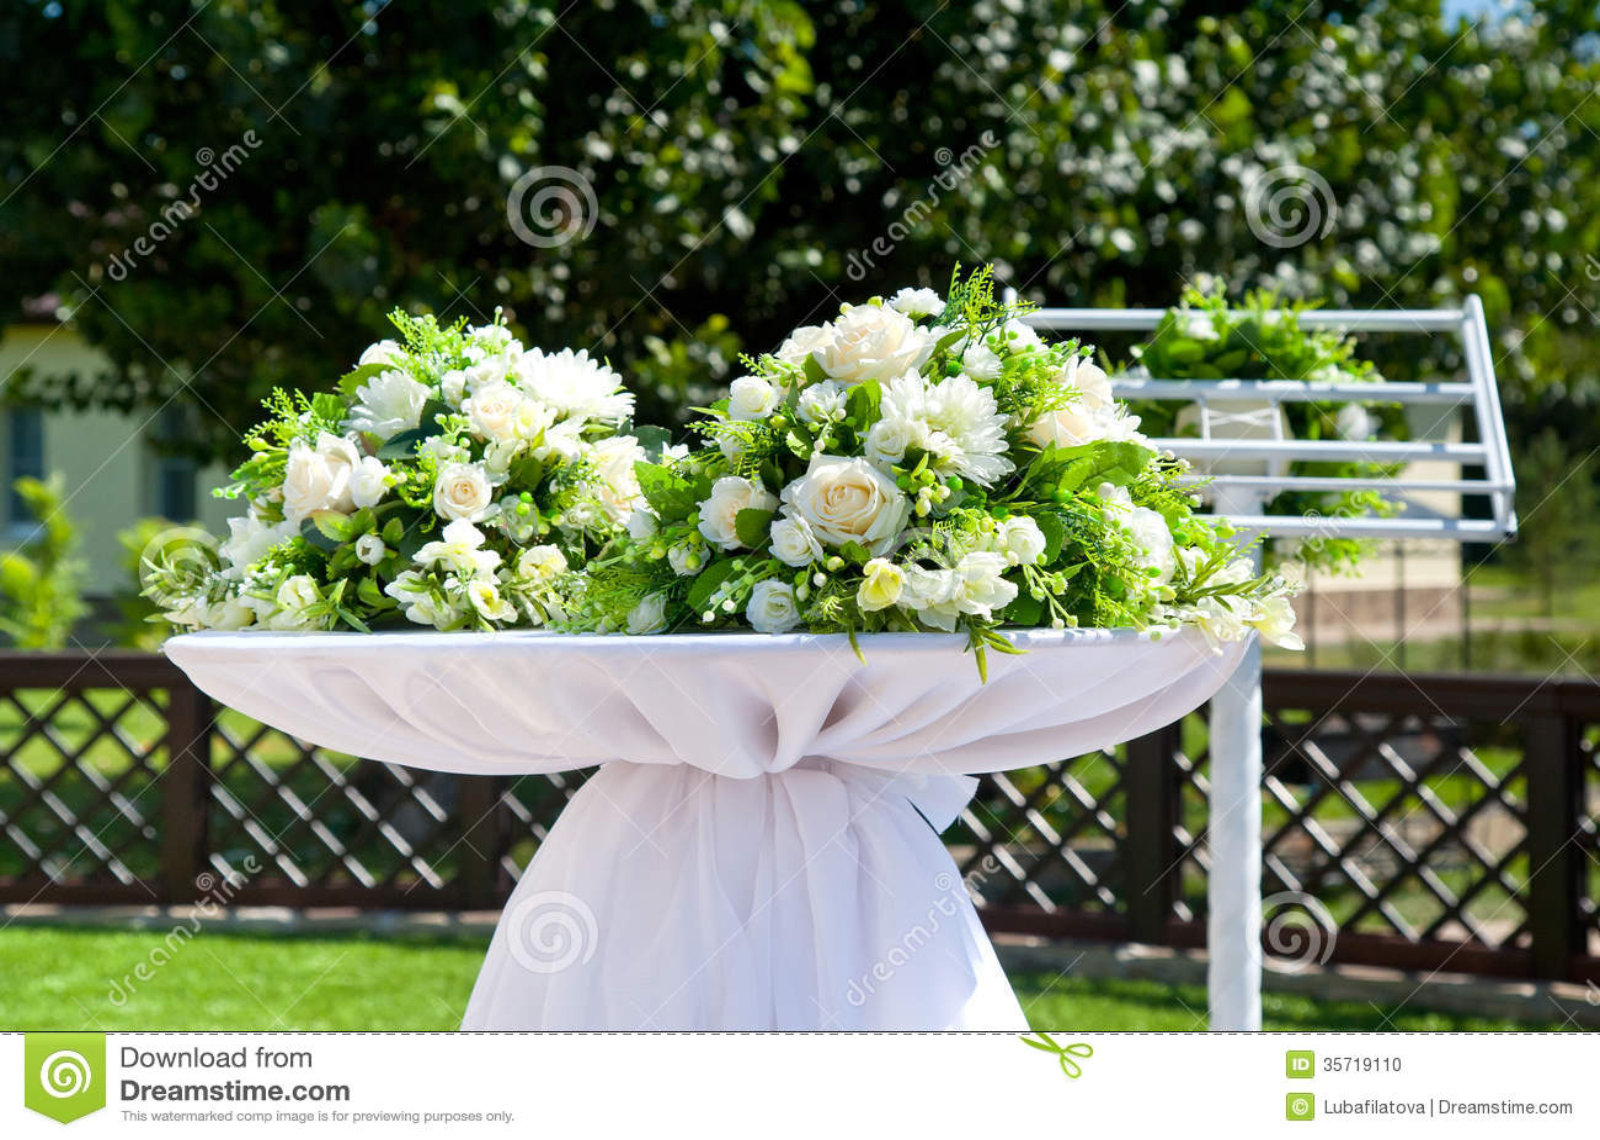 Beautiful Decor beautiful decor for wedding stock photo - image: 35719110